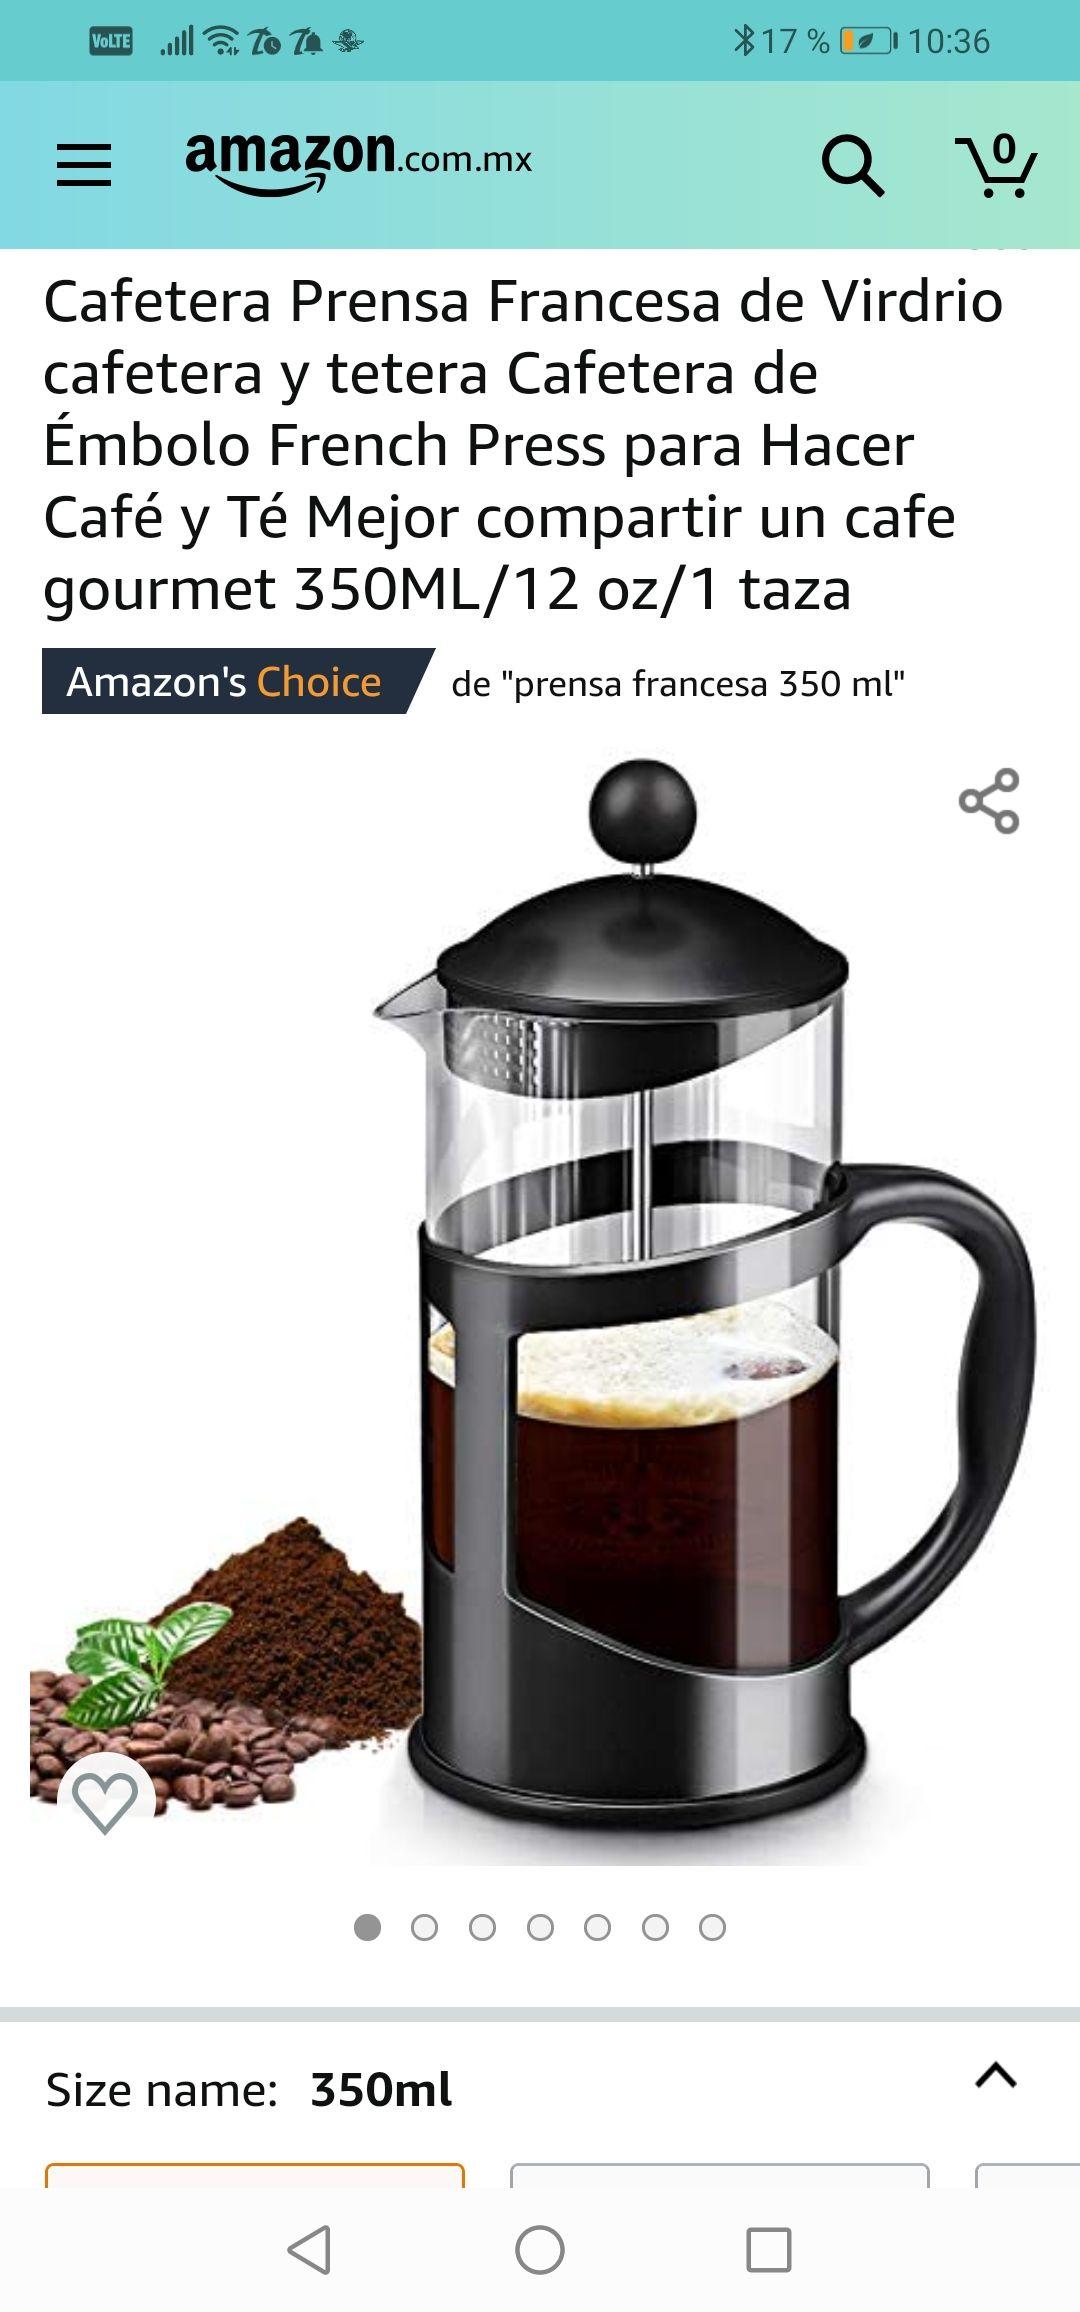 Amazon: Cafetera Prensa Francesa de Virdrio cafetera y tetera Cafetera de Émbolo 350 ml